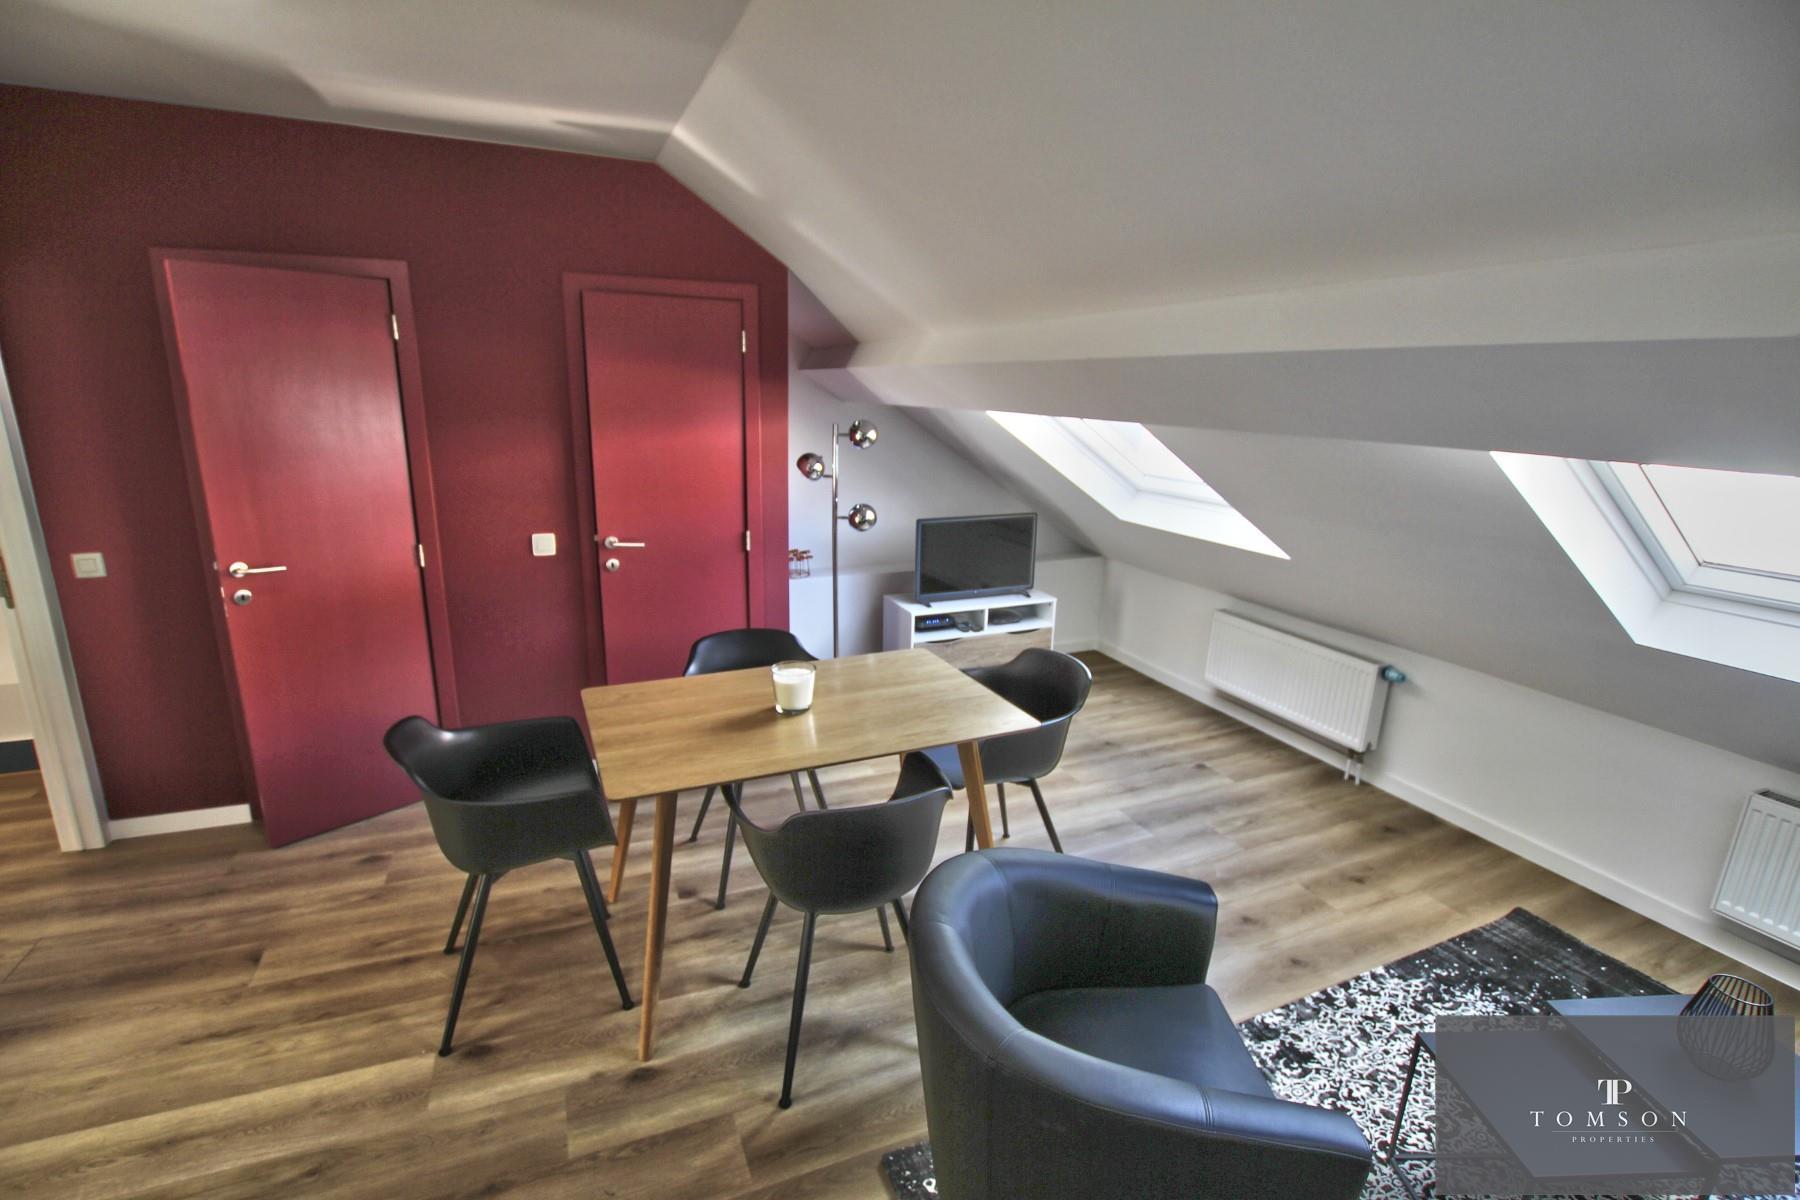 Flat - Etterbeek - #4328604-2